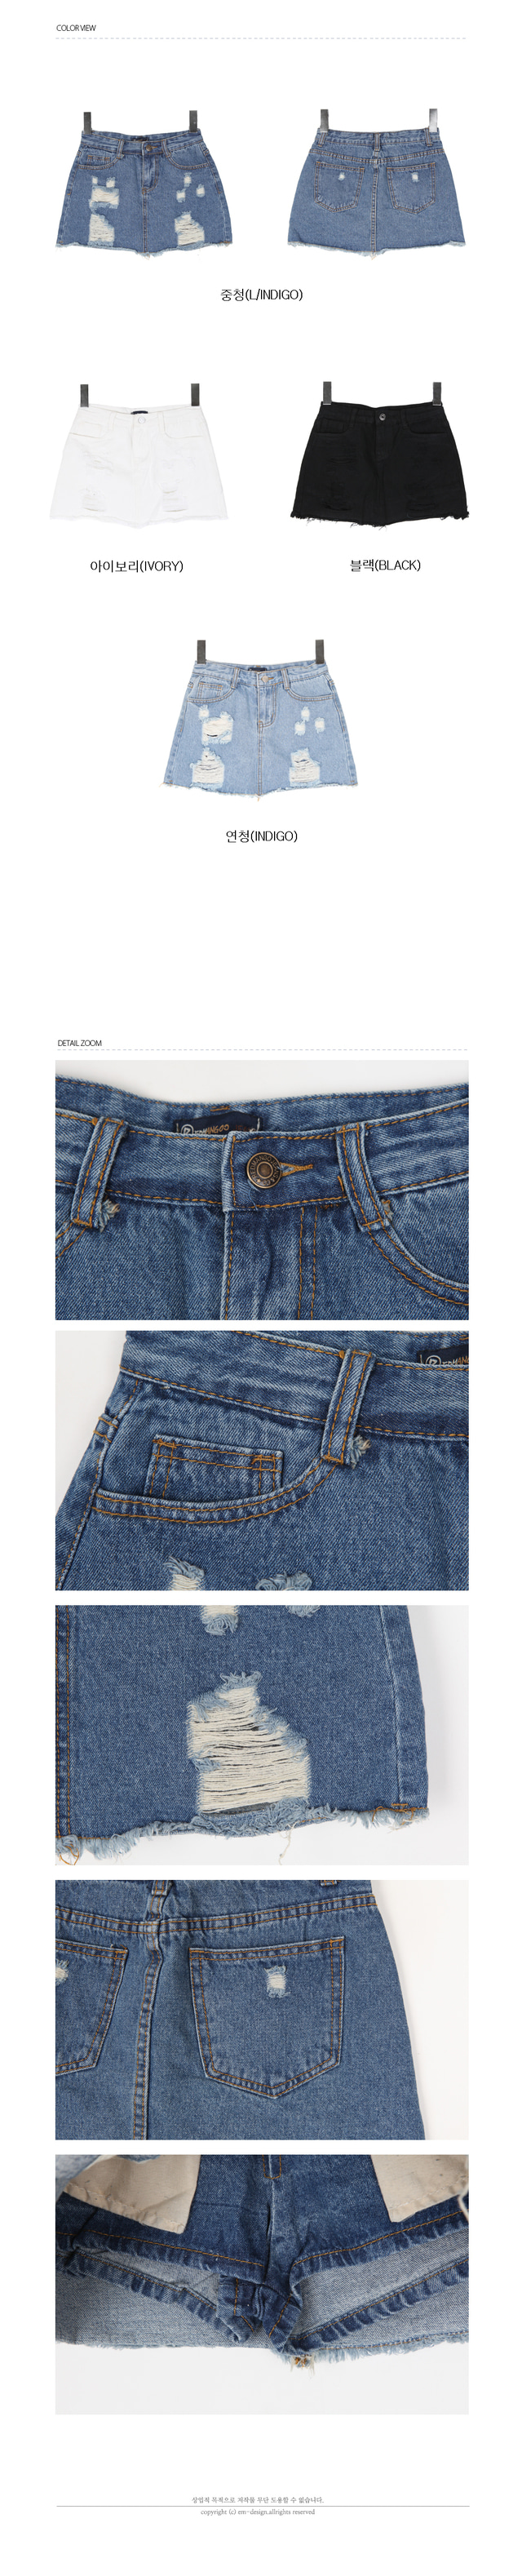 Tango Cutting Denim Skirt # Skirt Pants